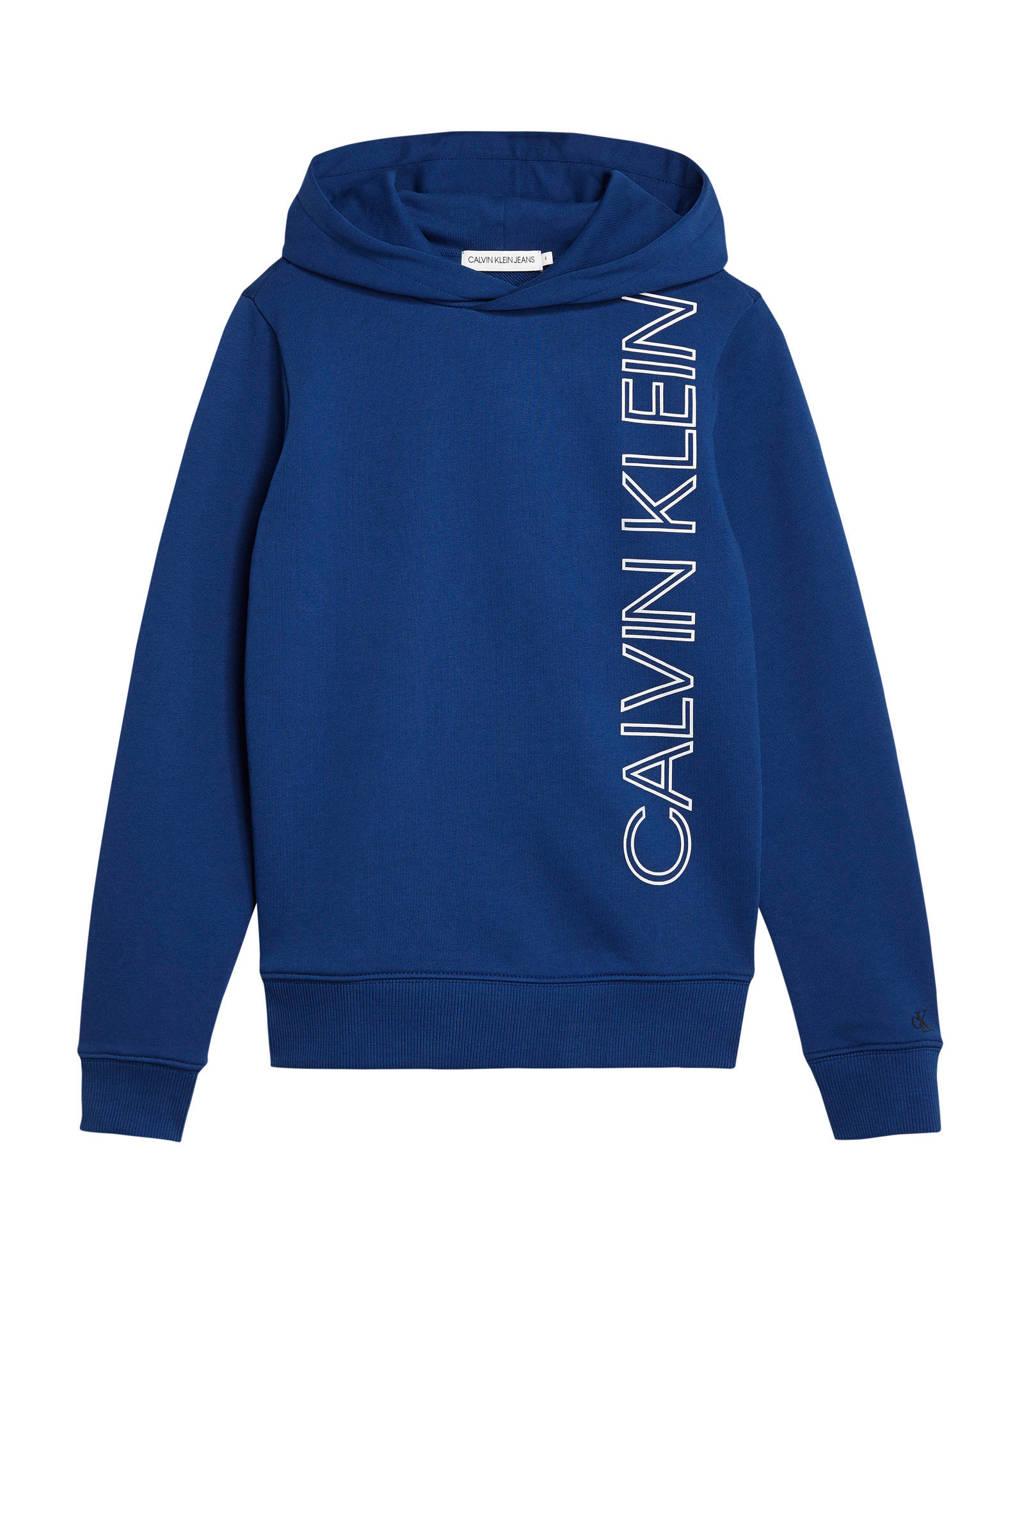 CALVIN KLEIN JEANS hoodie met logo blauw, Blauw